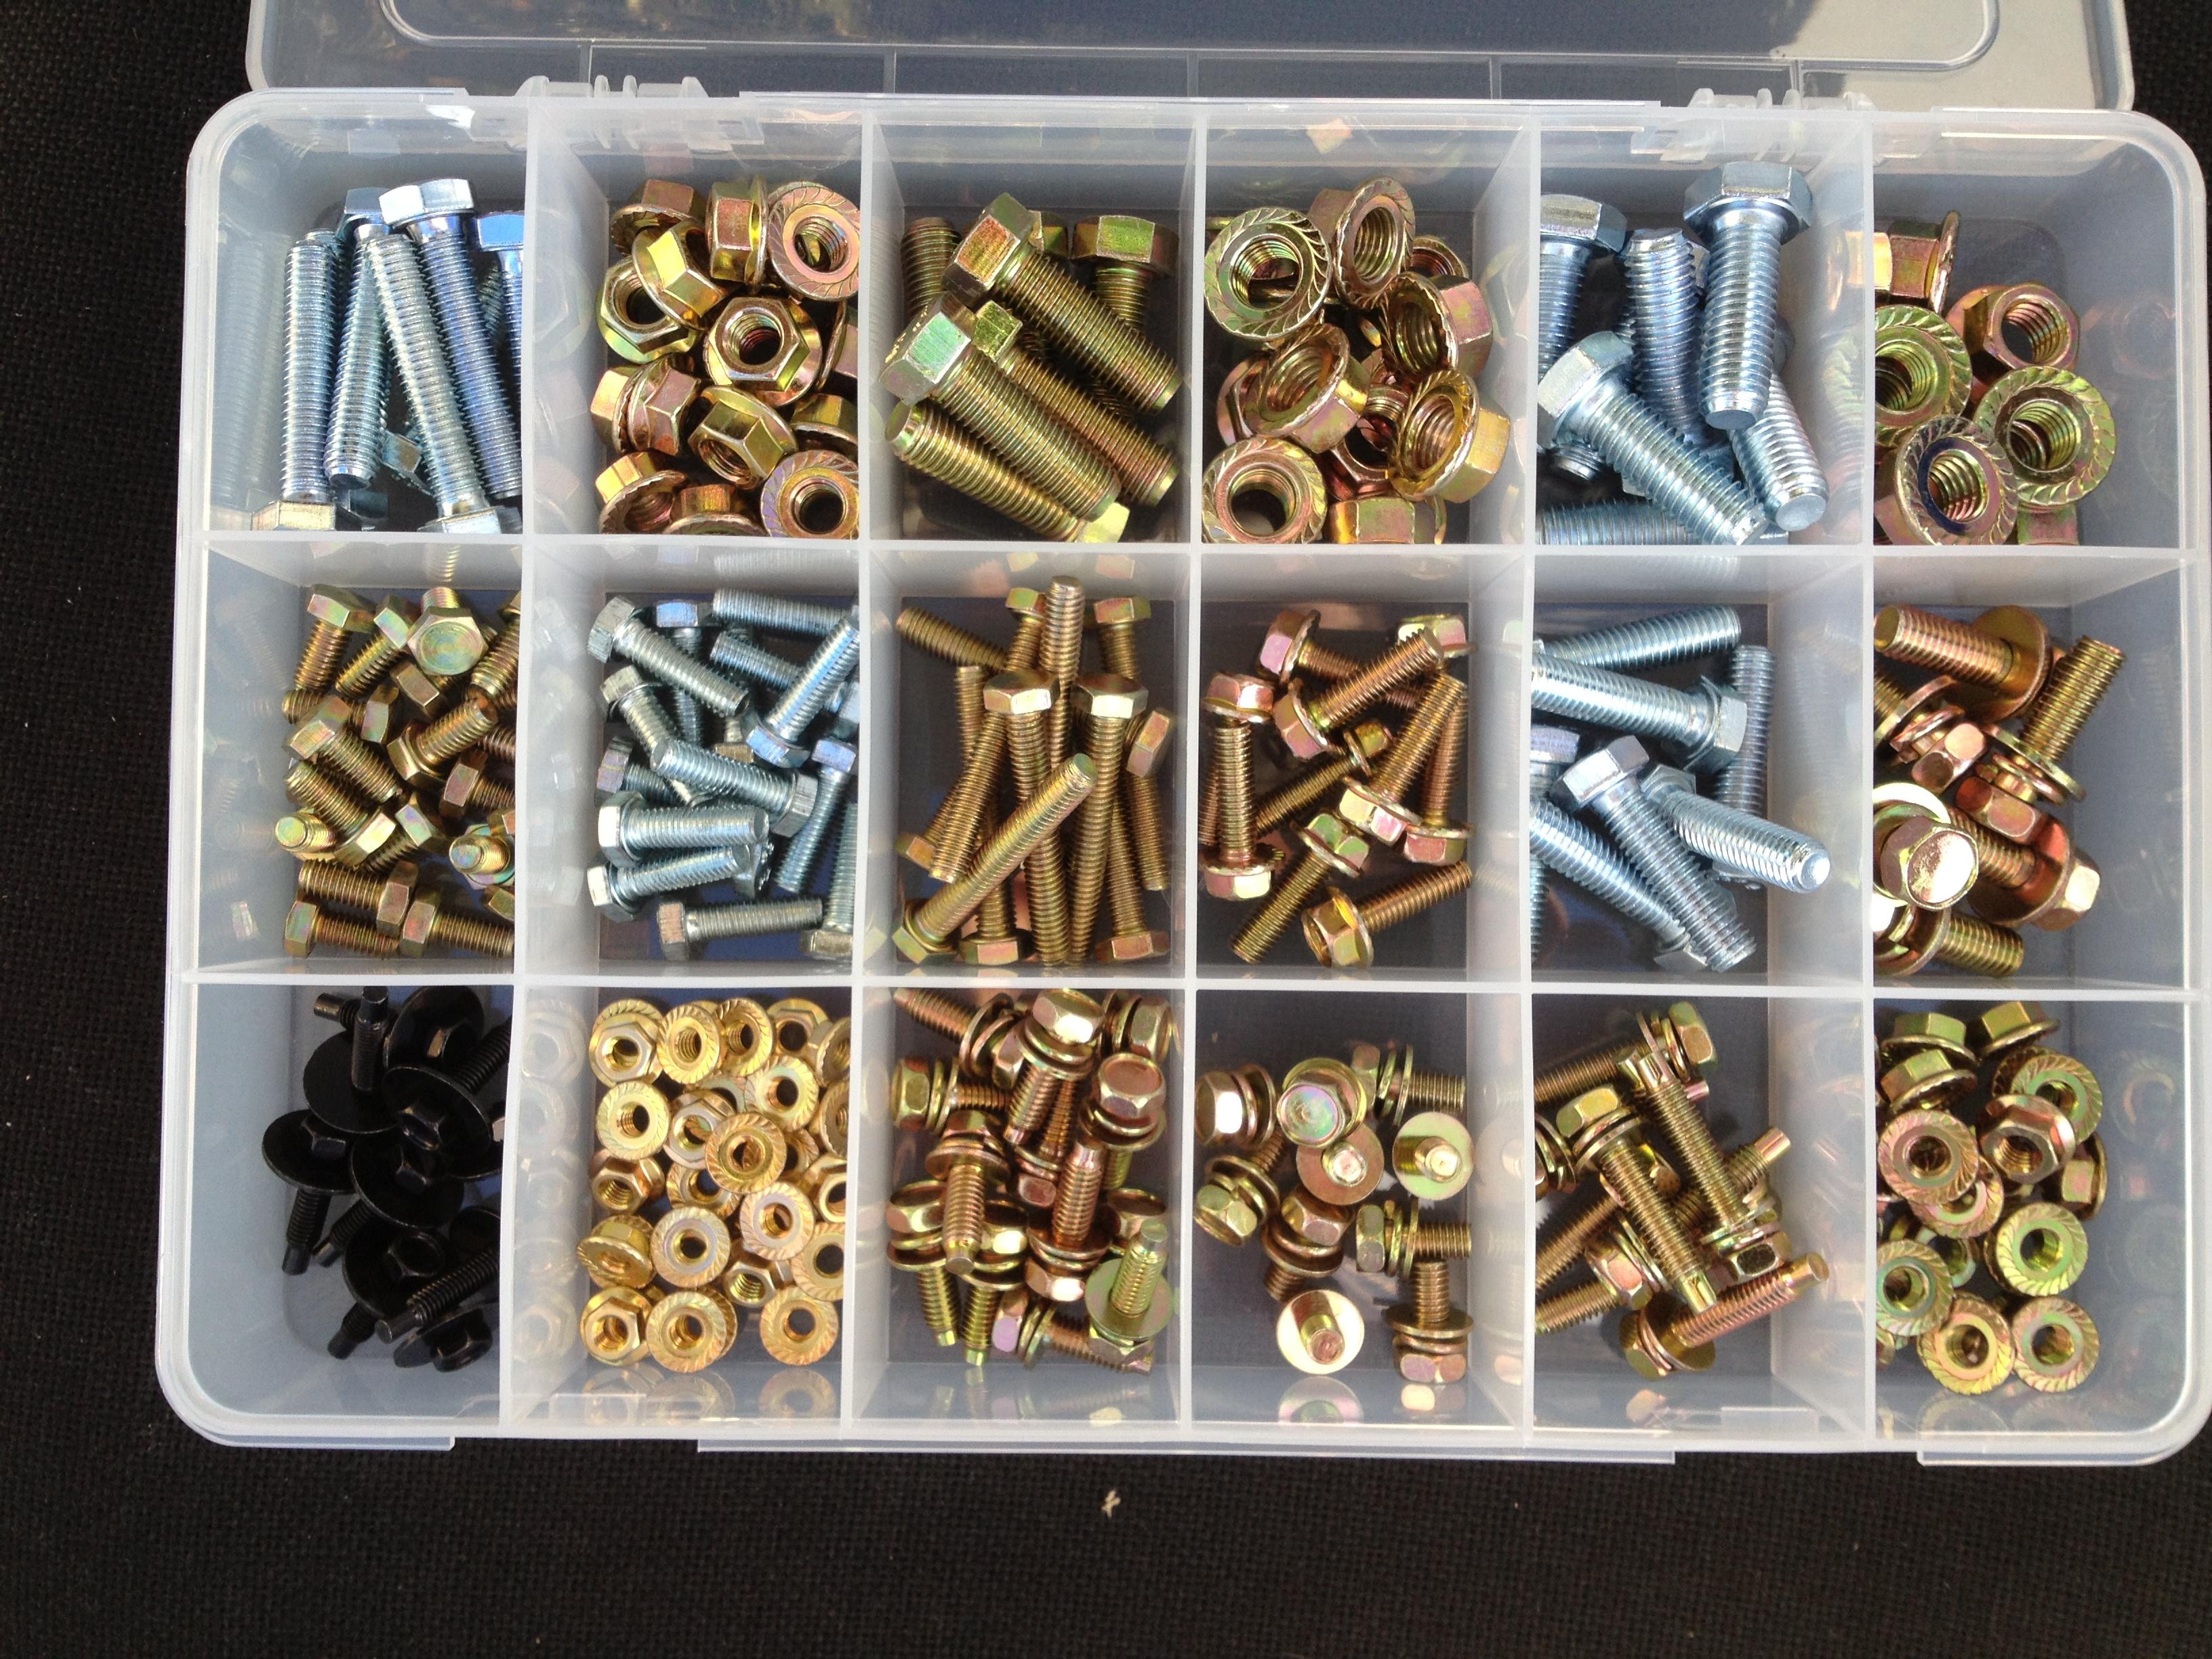 B1056 Kit - Metric bolts & nuts kit 18 compartment